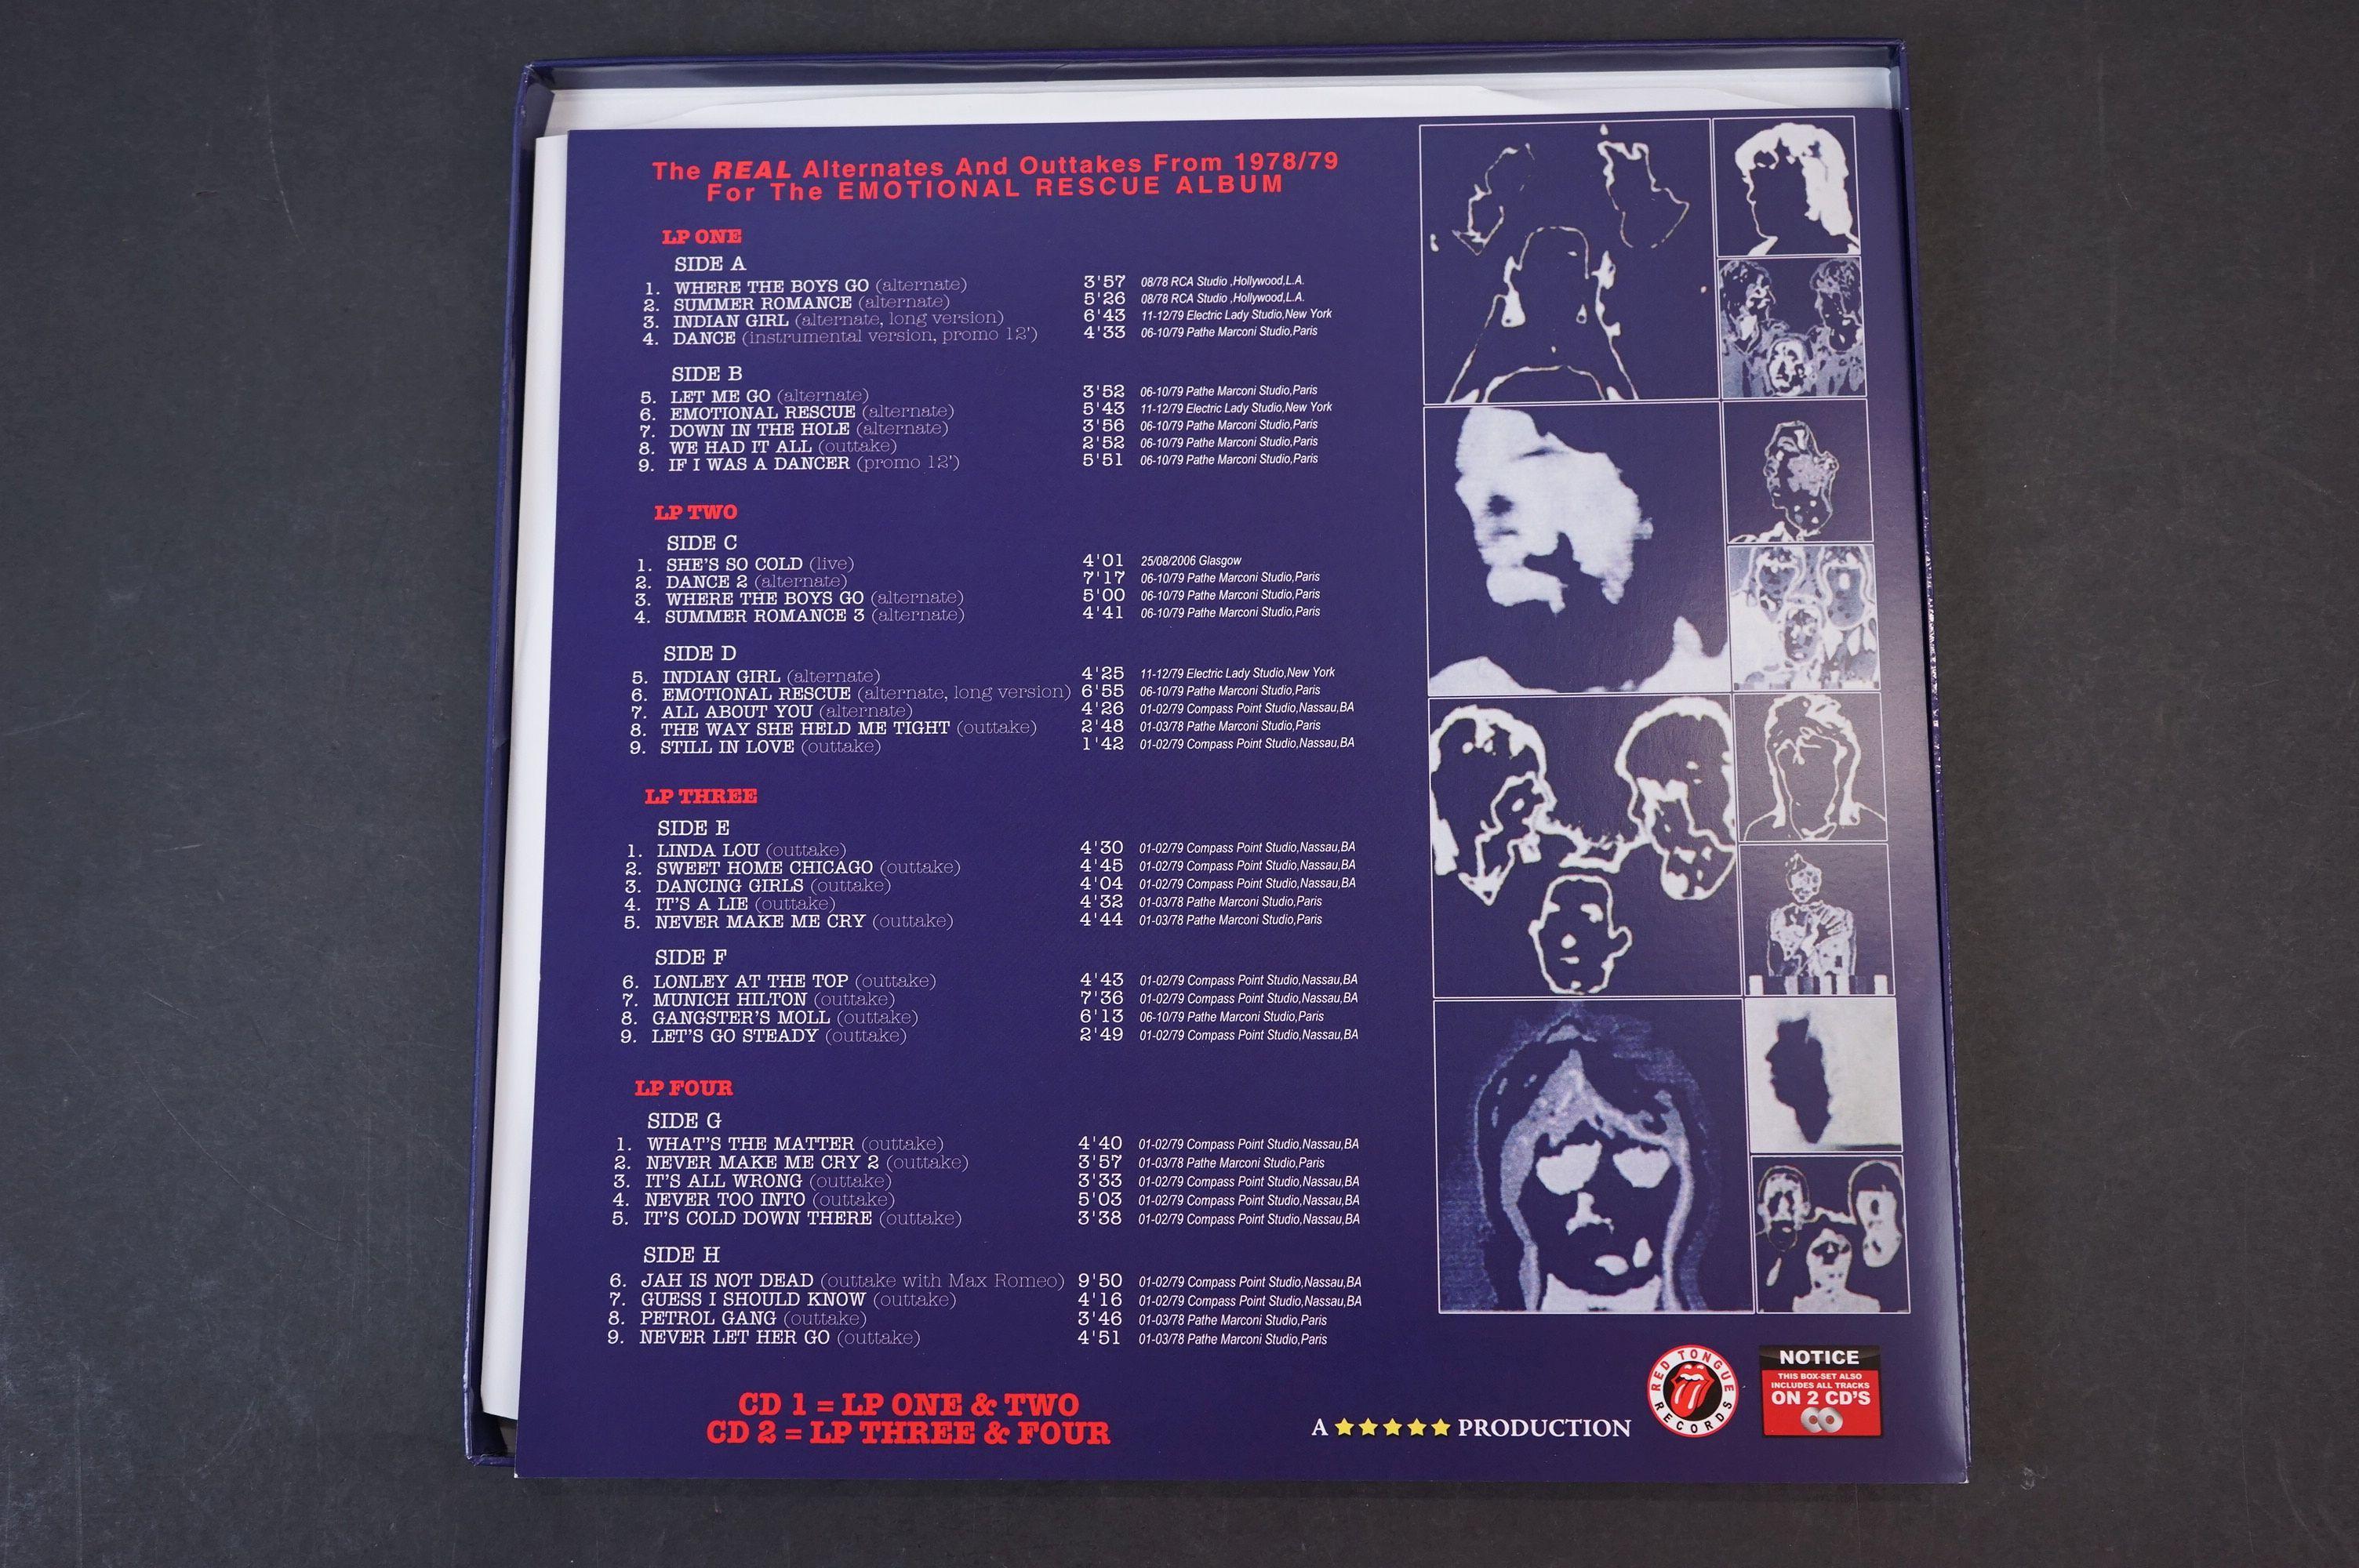 Vinyl - ltd edn The Real Alternate Album Rolling Stones Emotional Rescue 4 LP / 2 CD Box Set, - Image 5 of 12